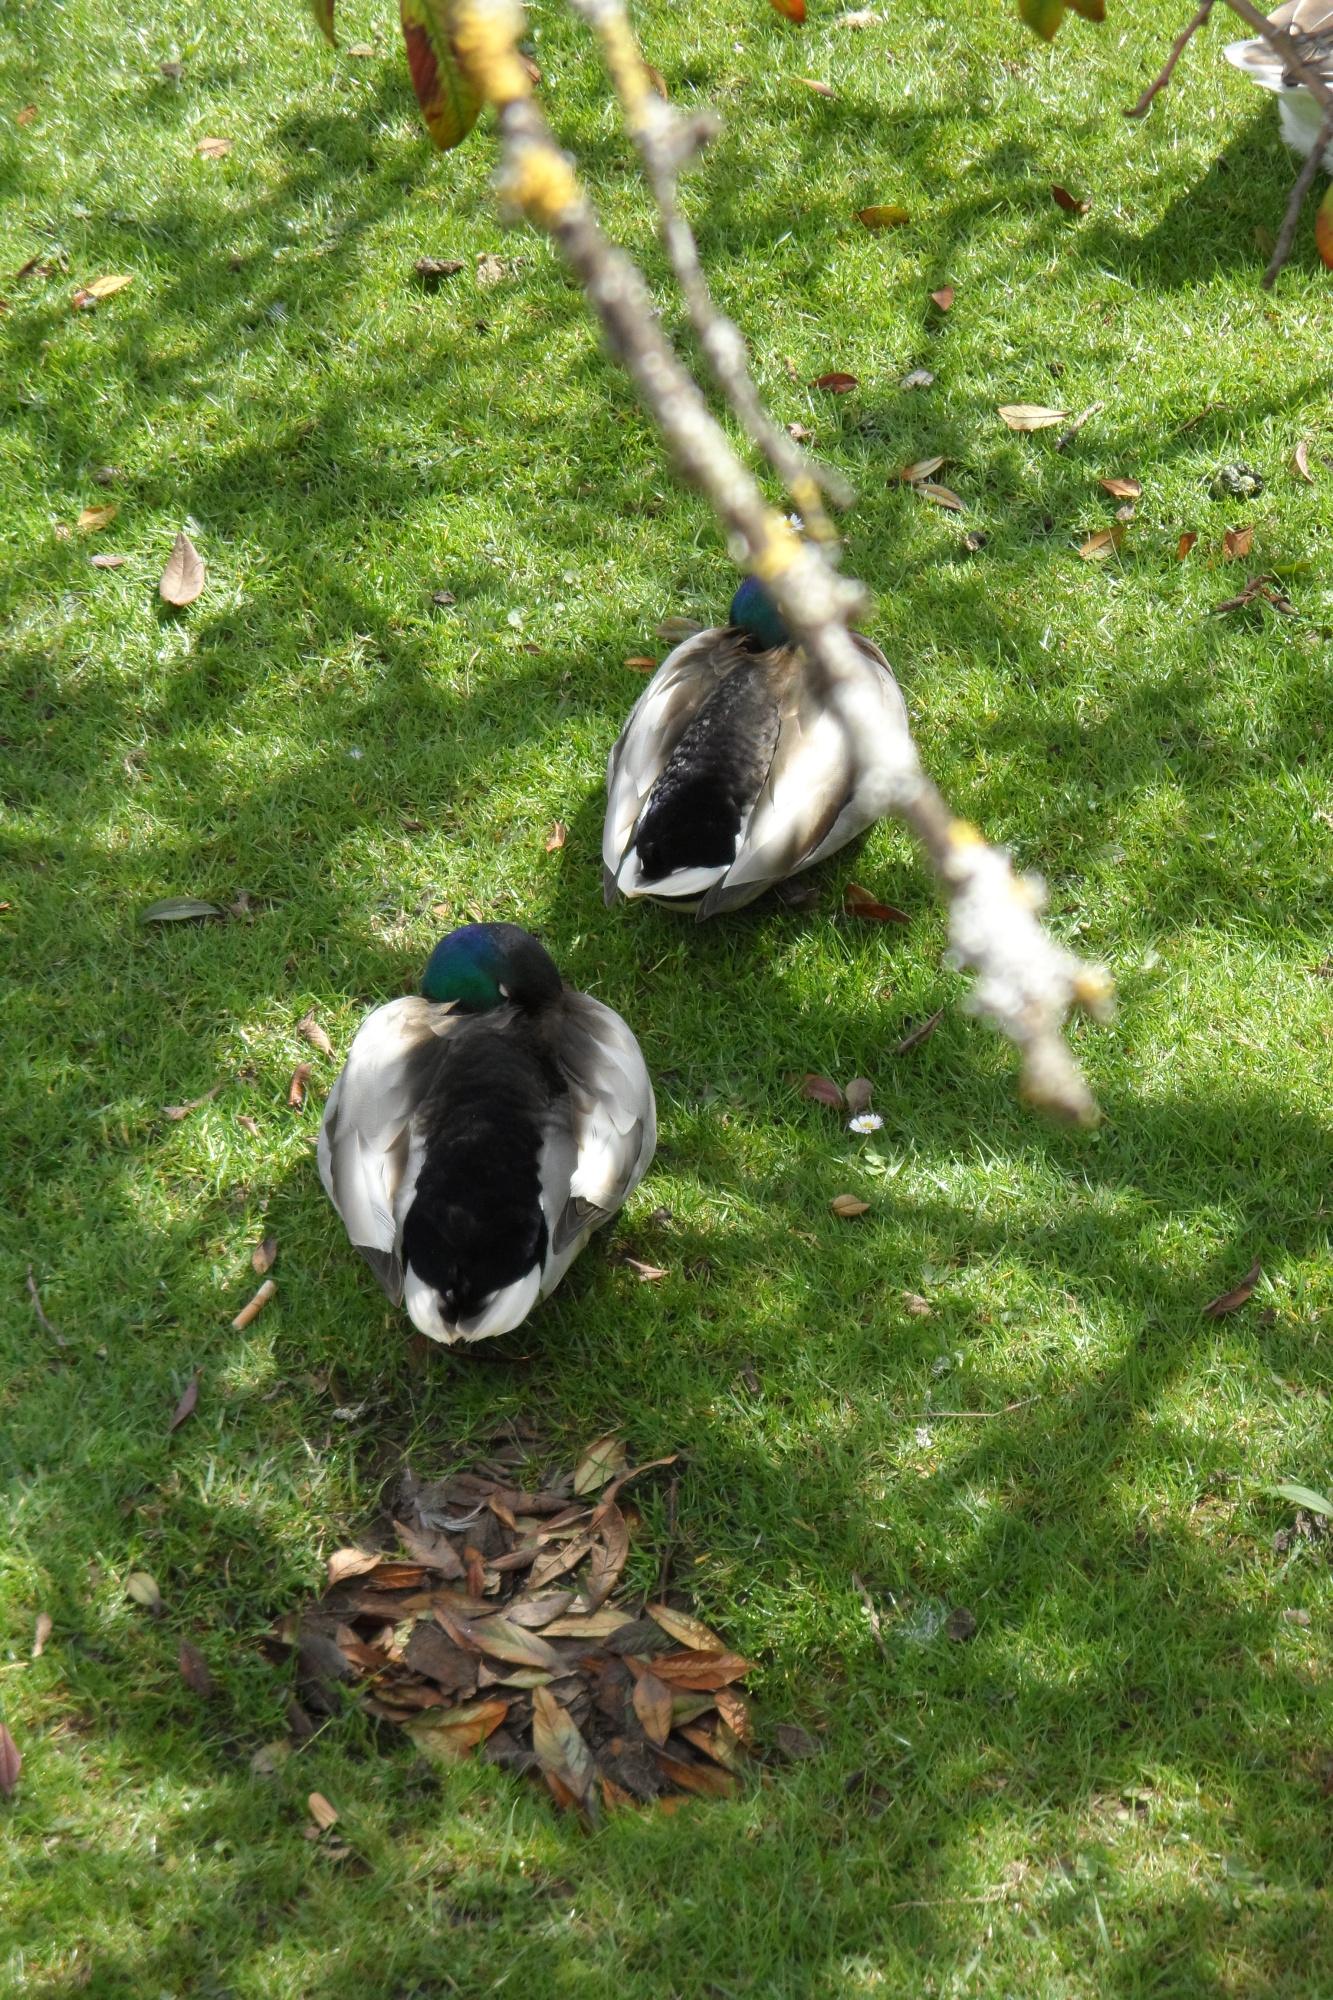 Ducks having a rest